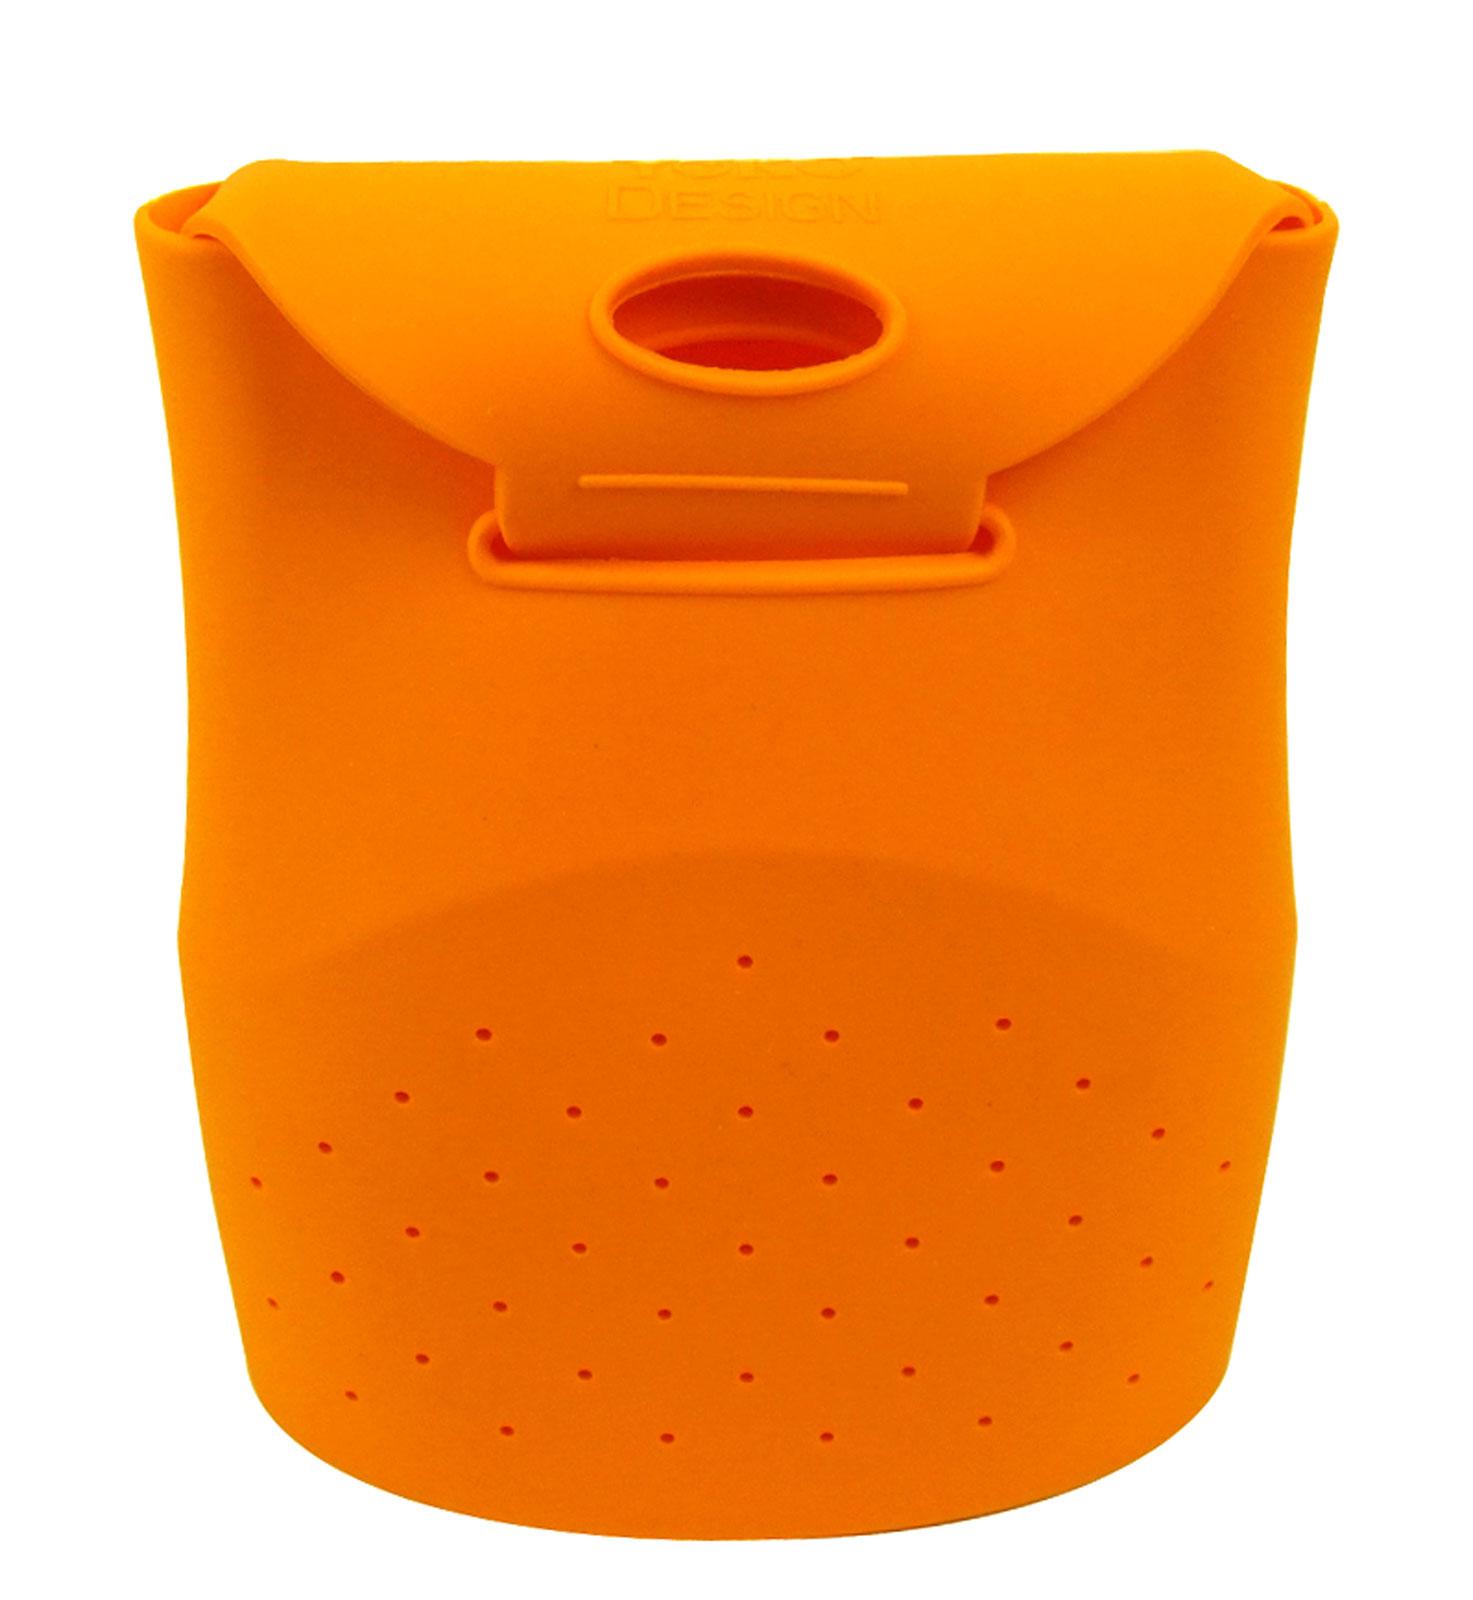 silikon mikrowelle tasche, küche silikon orange kochbeutel reis ... - Silikon Küche